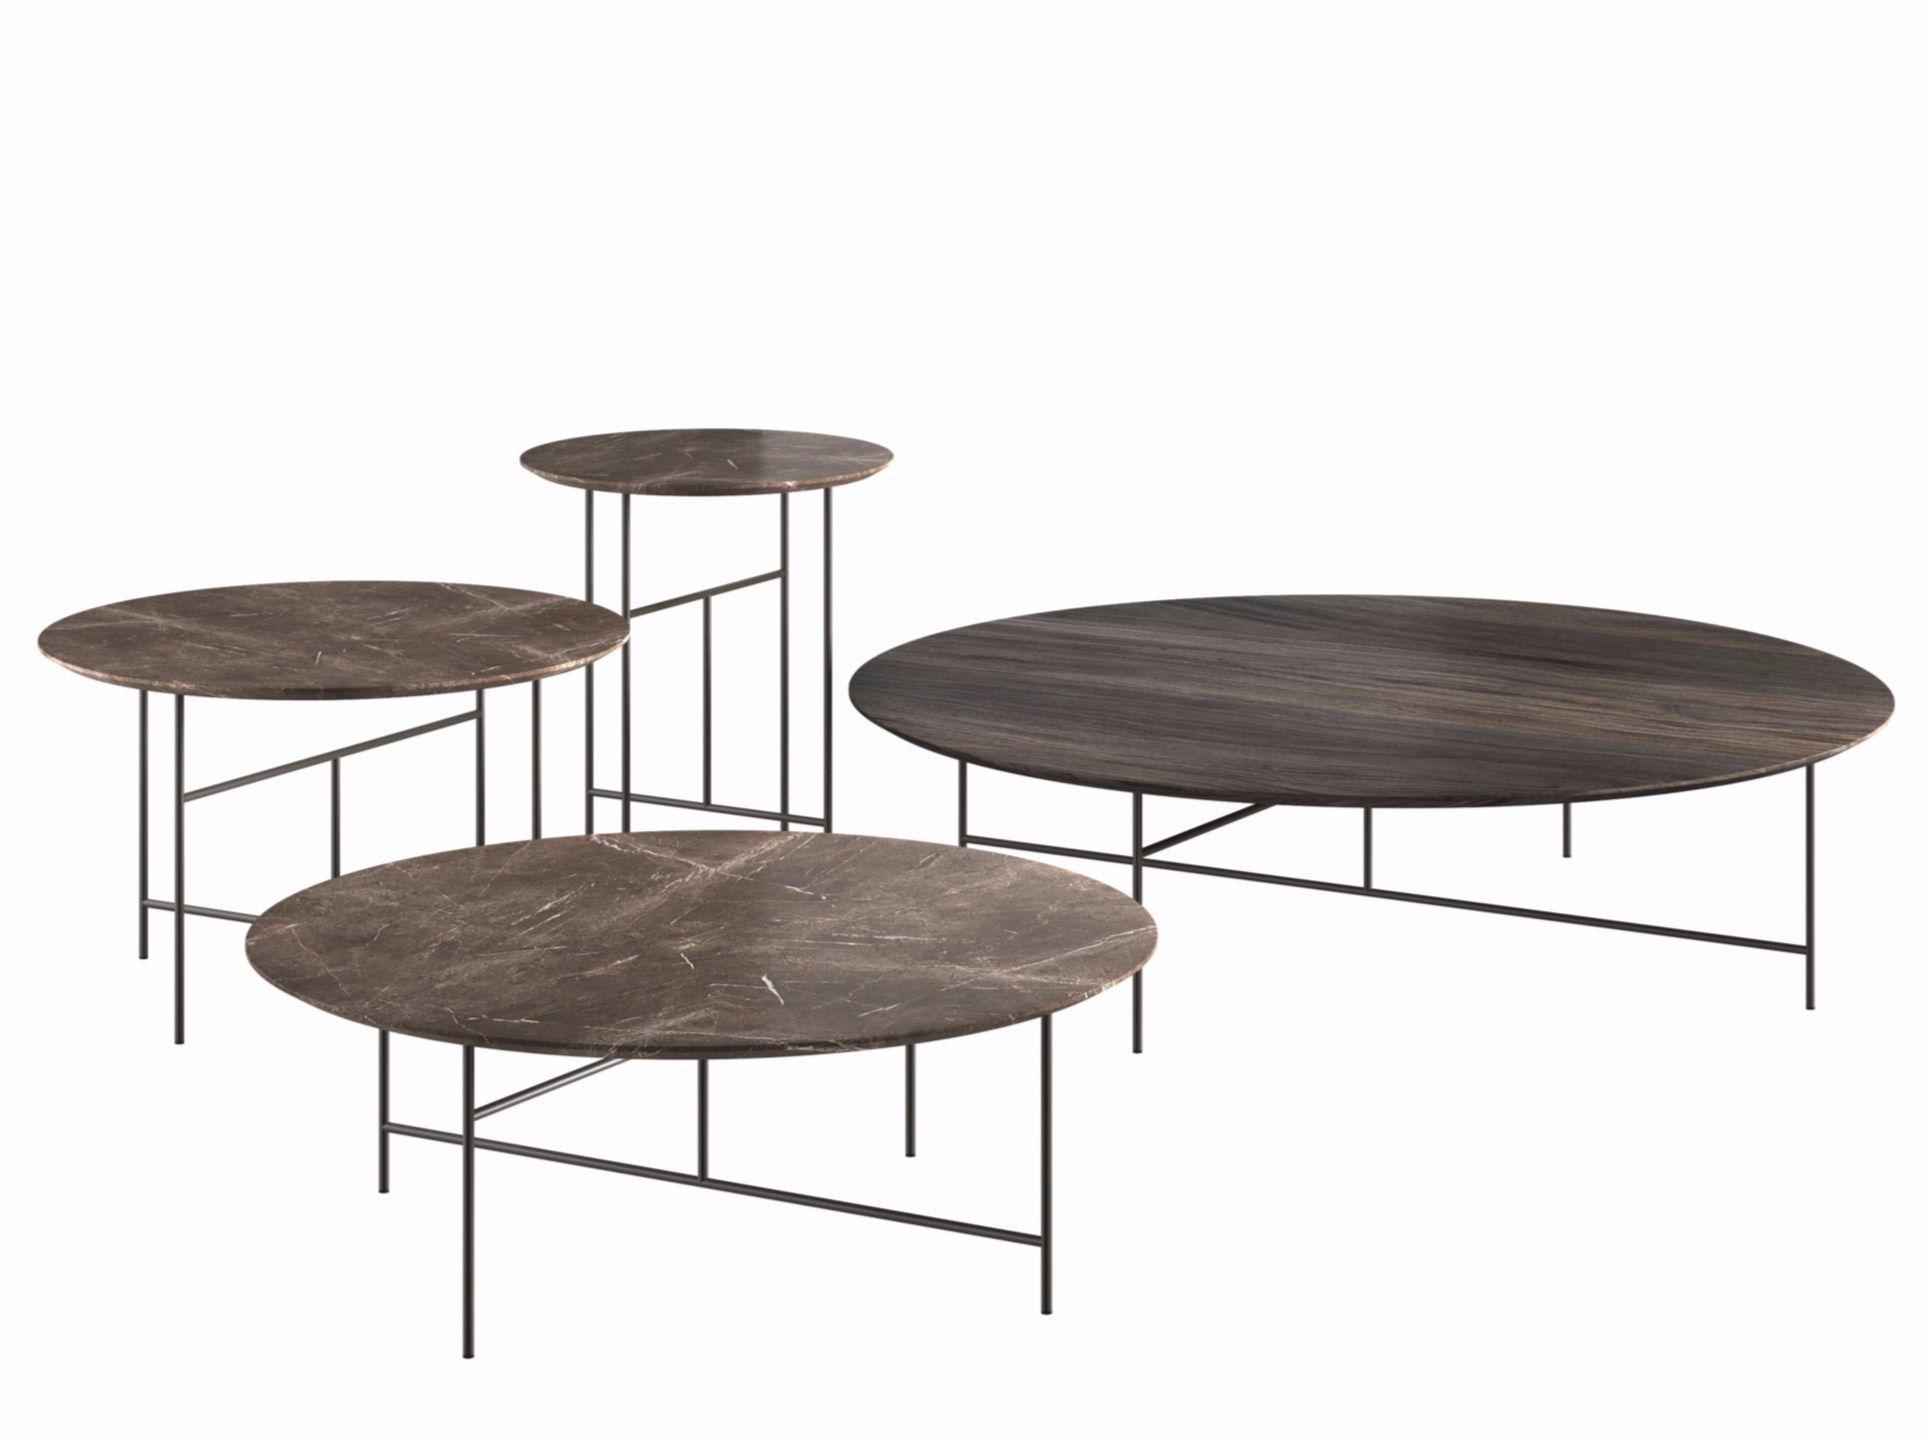 Padovano Mobili ~ Contemporary style round coffee table sen by de padova design